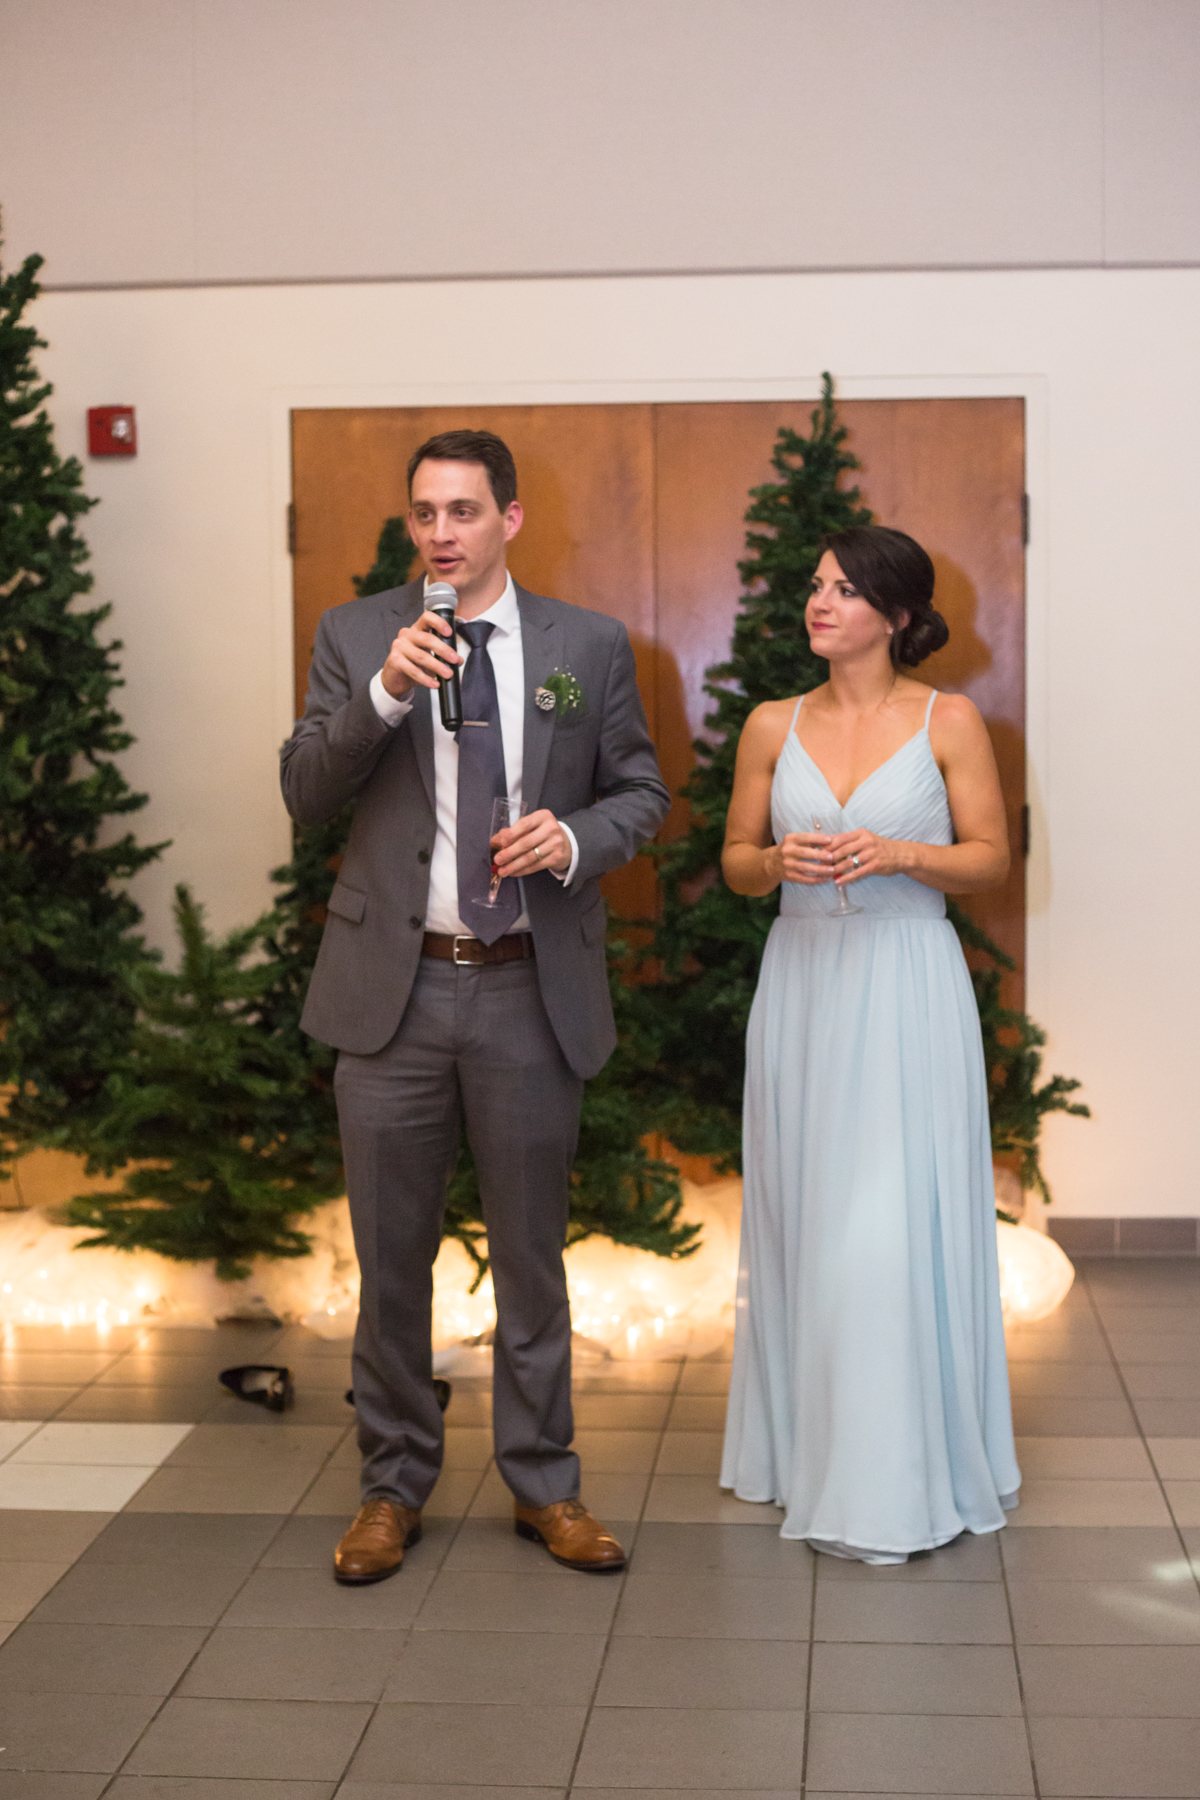 Kelli-and-Matt-Nashville-Wedding-Sneak-Peak-0301.jpg